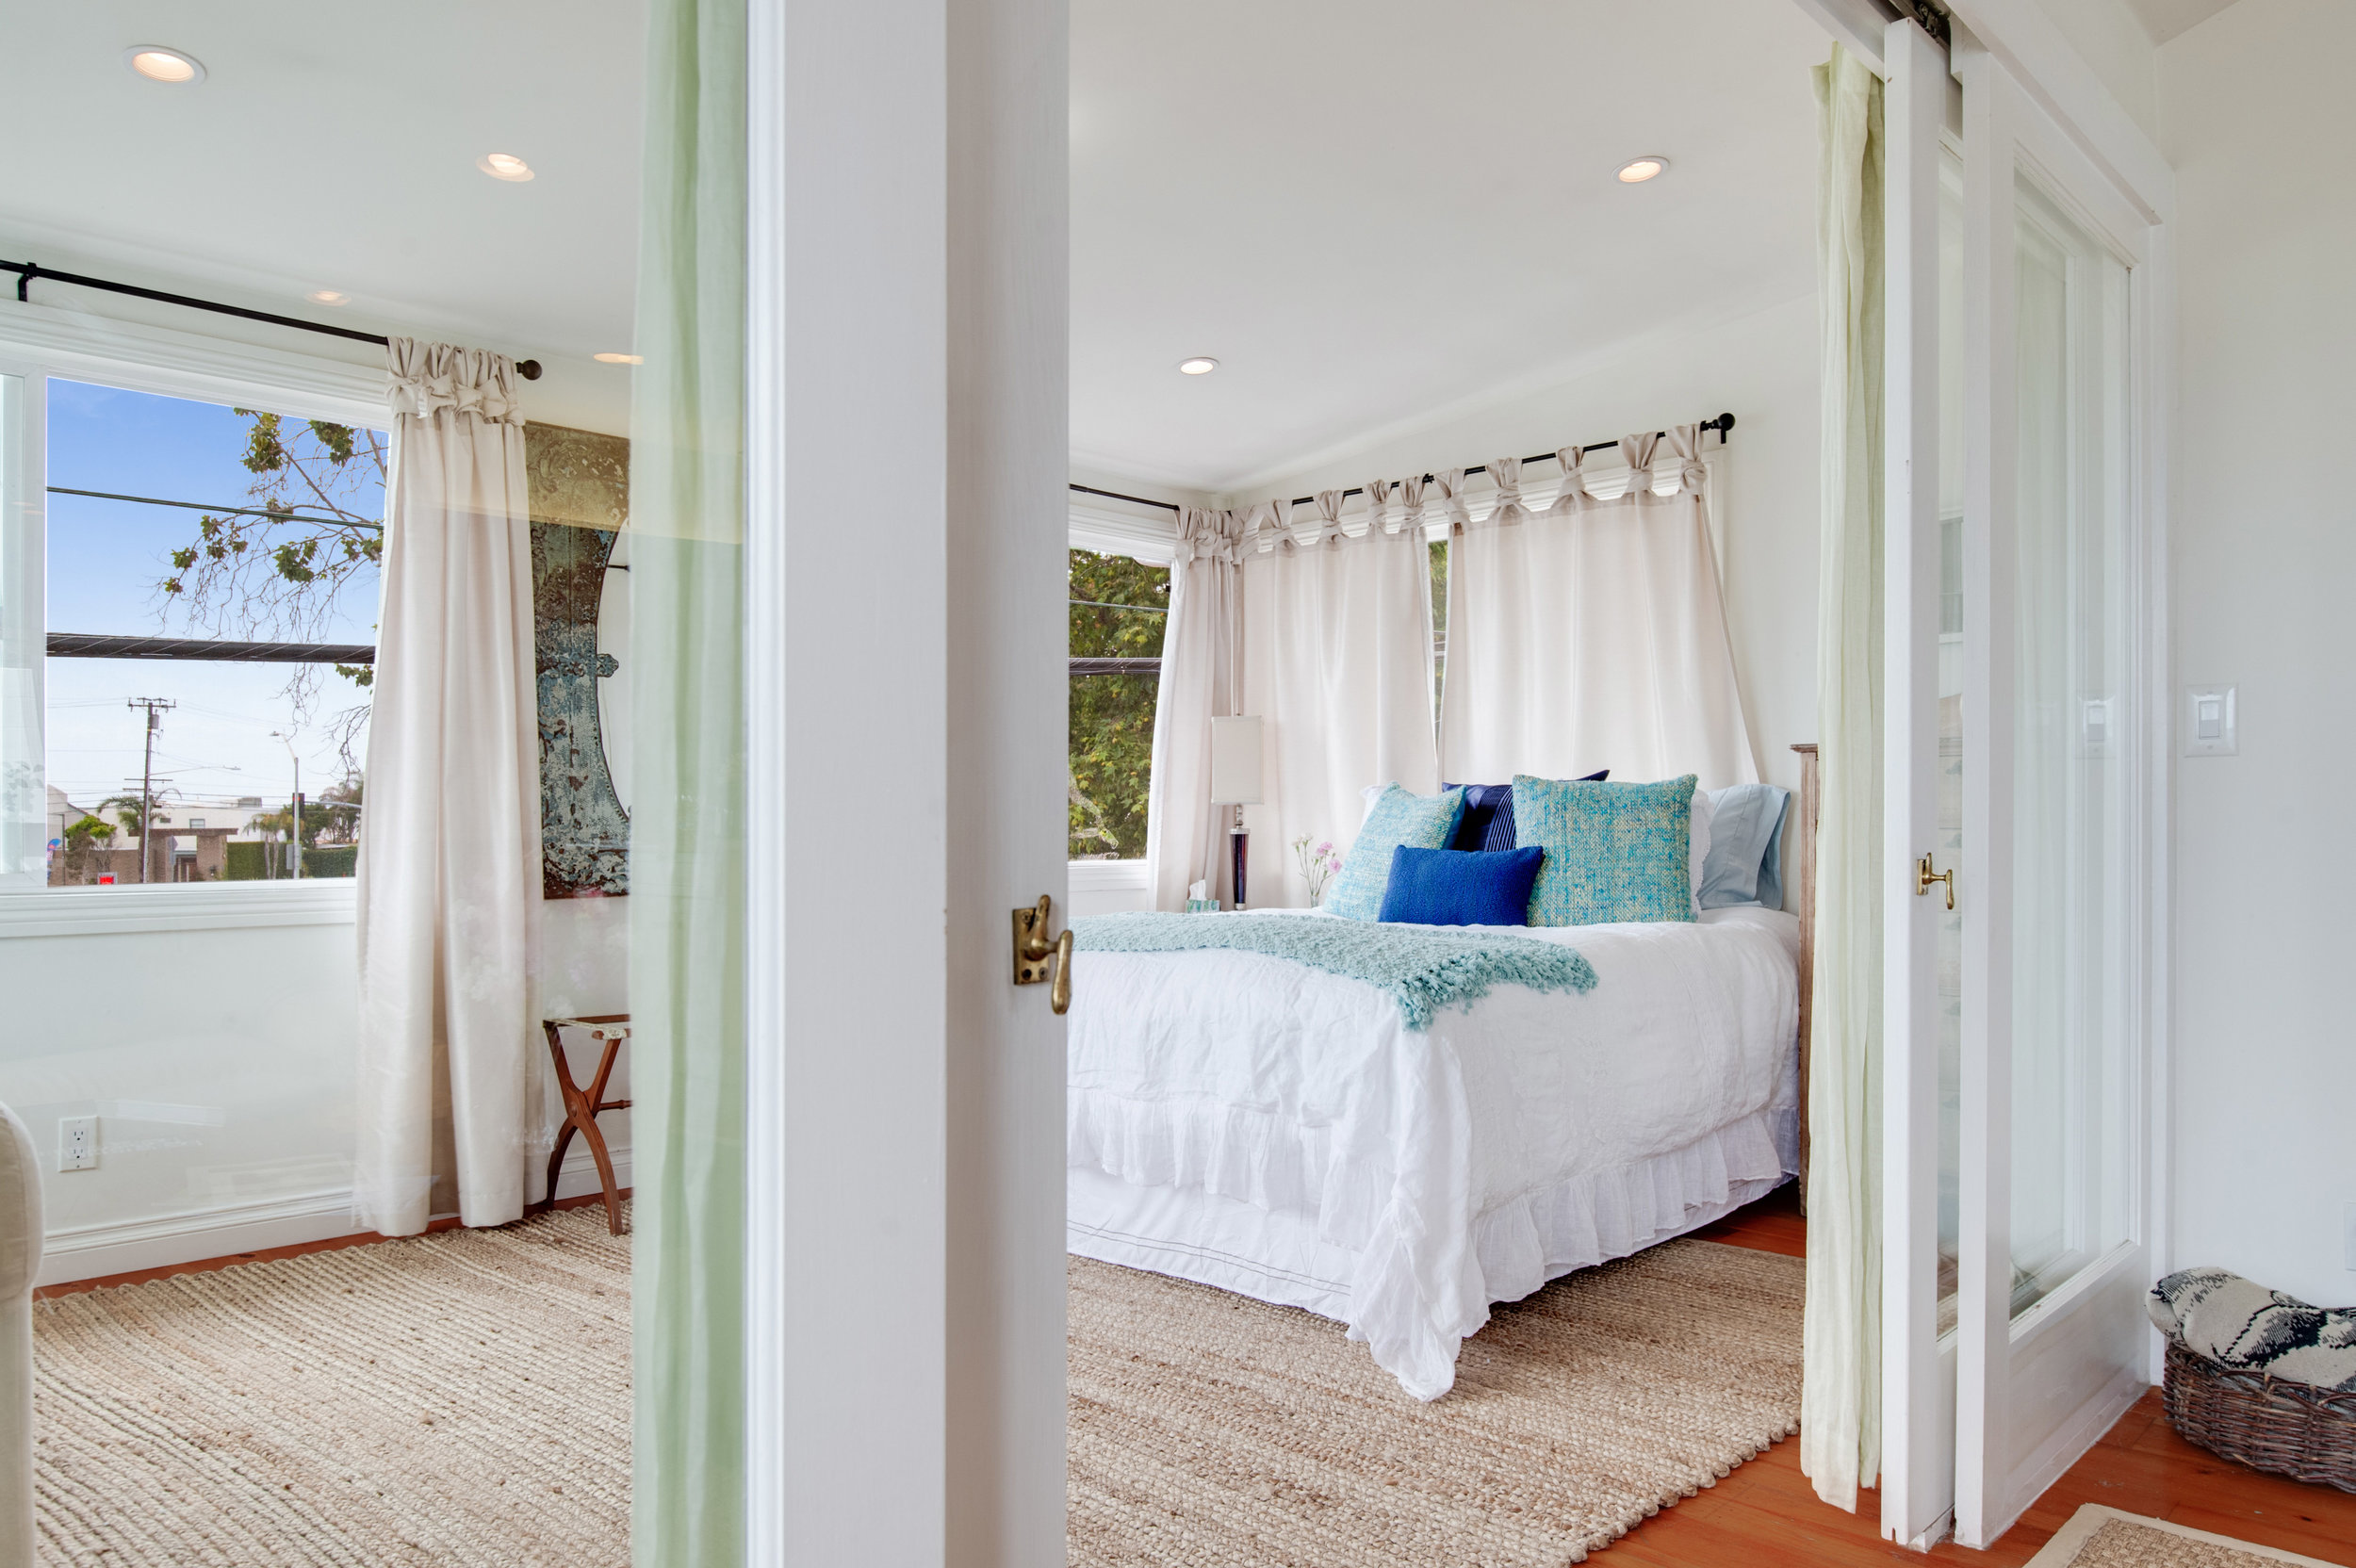 006 Bedroom 3952 Las Flores For Sale Lease The Malibu Life Team Luxury Real Estate.jpg